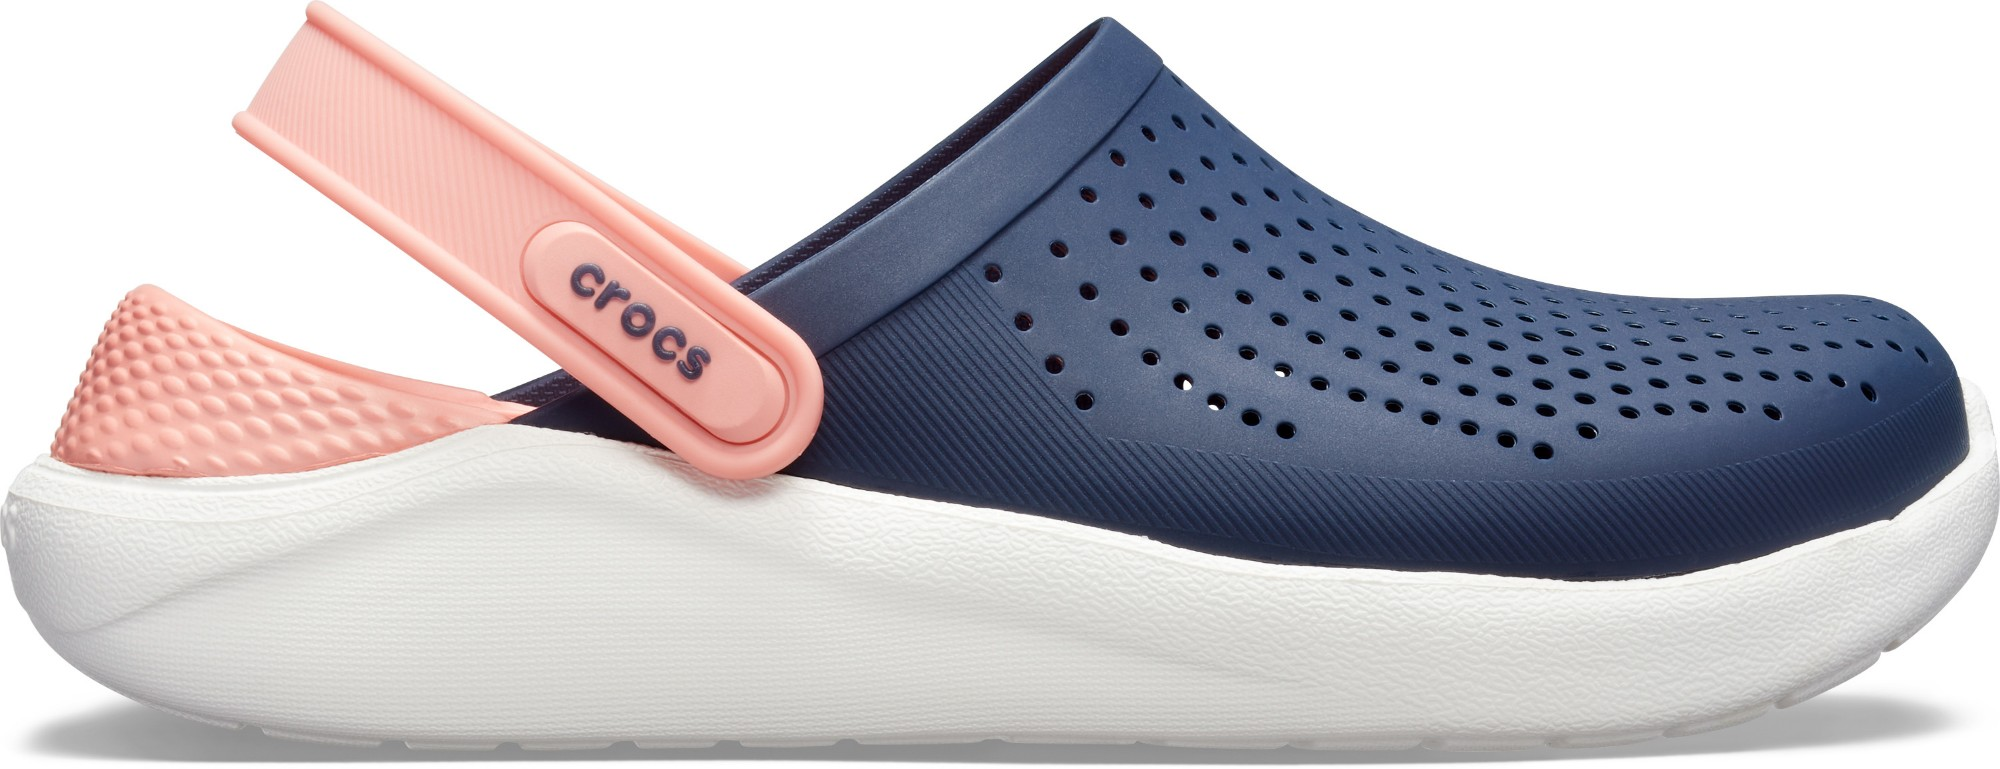 Crocs™ LiteRide Clog Navy/Melon 36,5